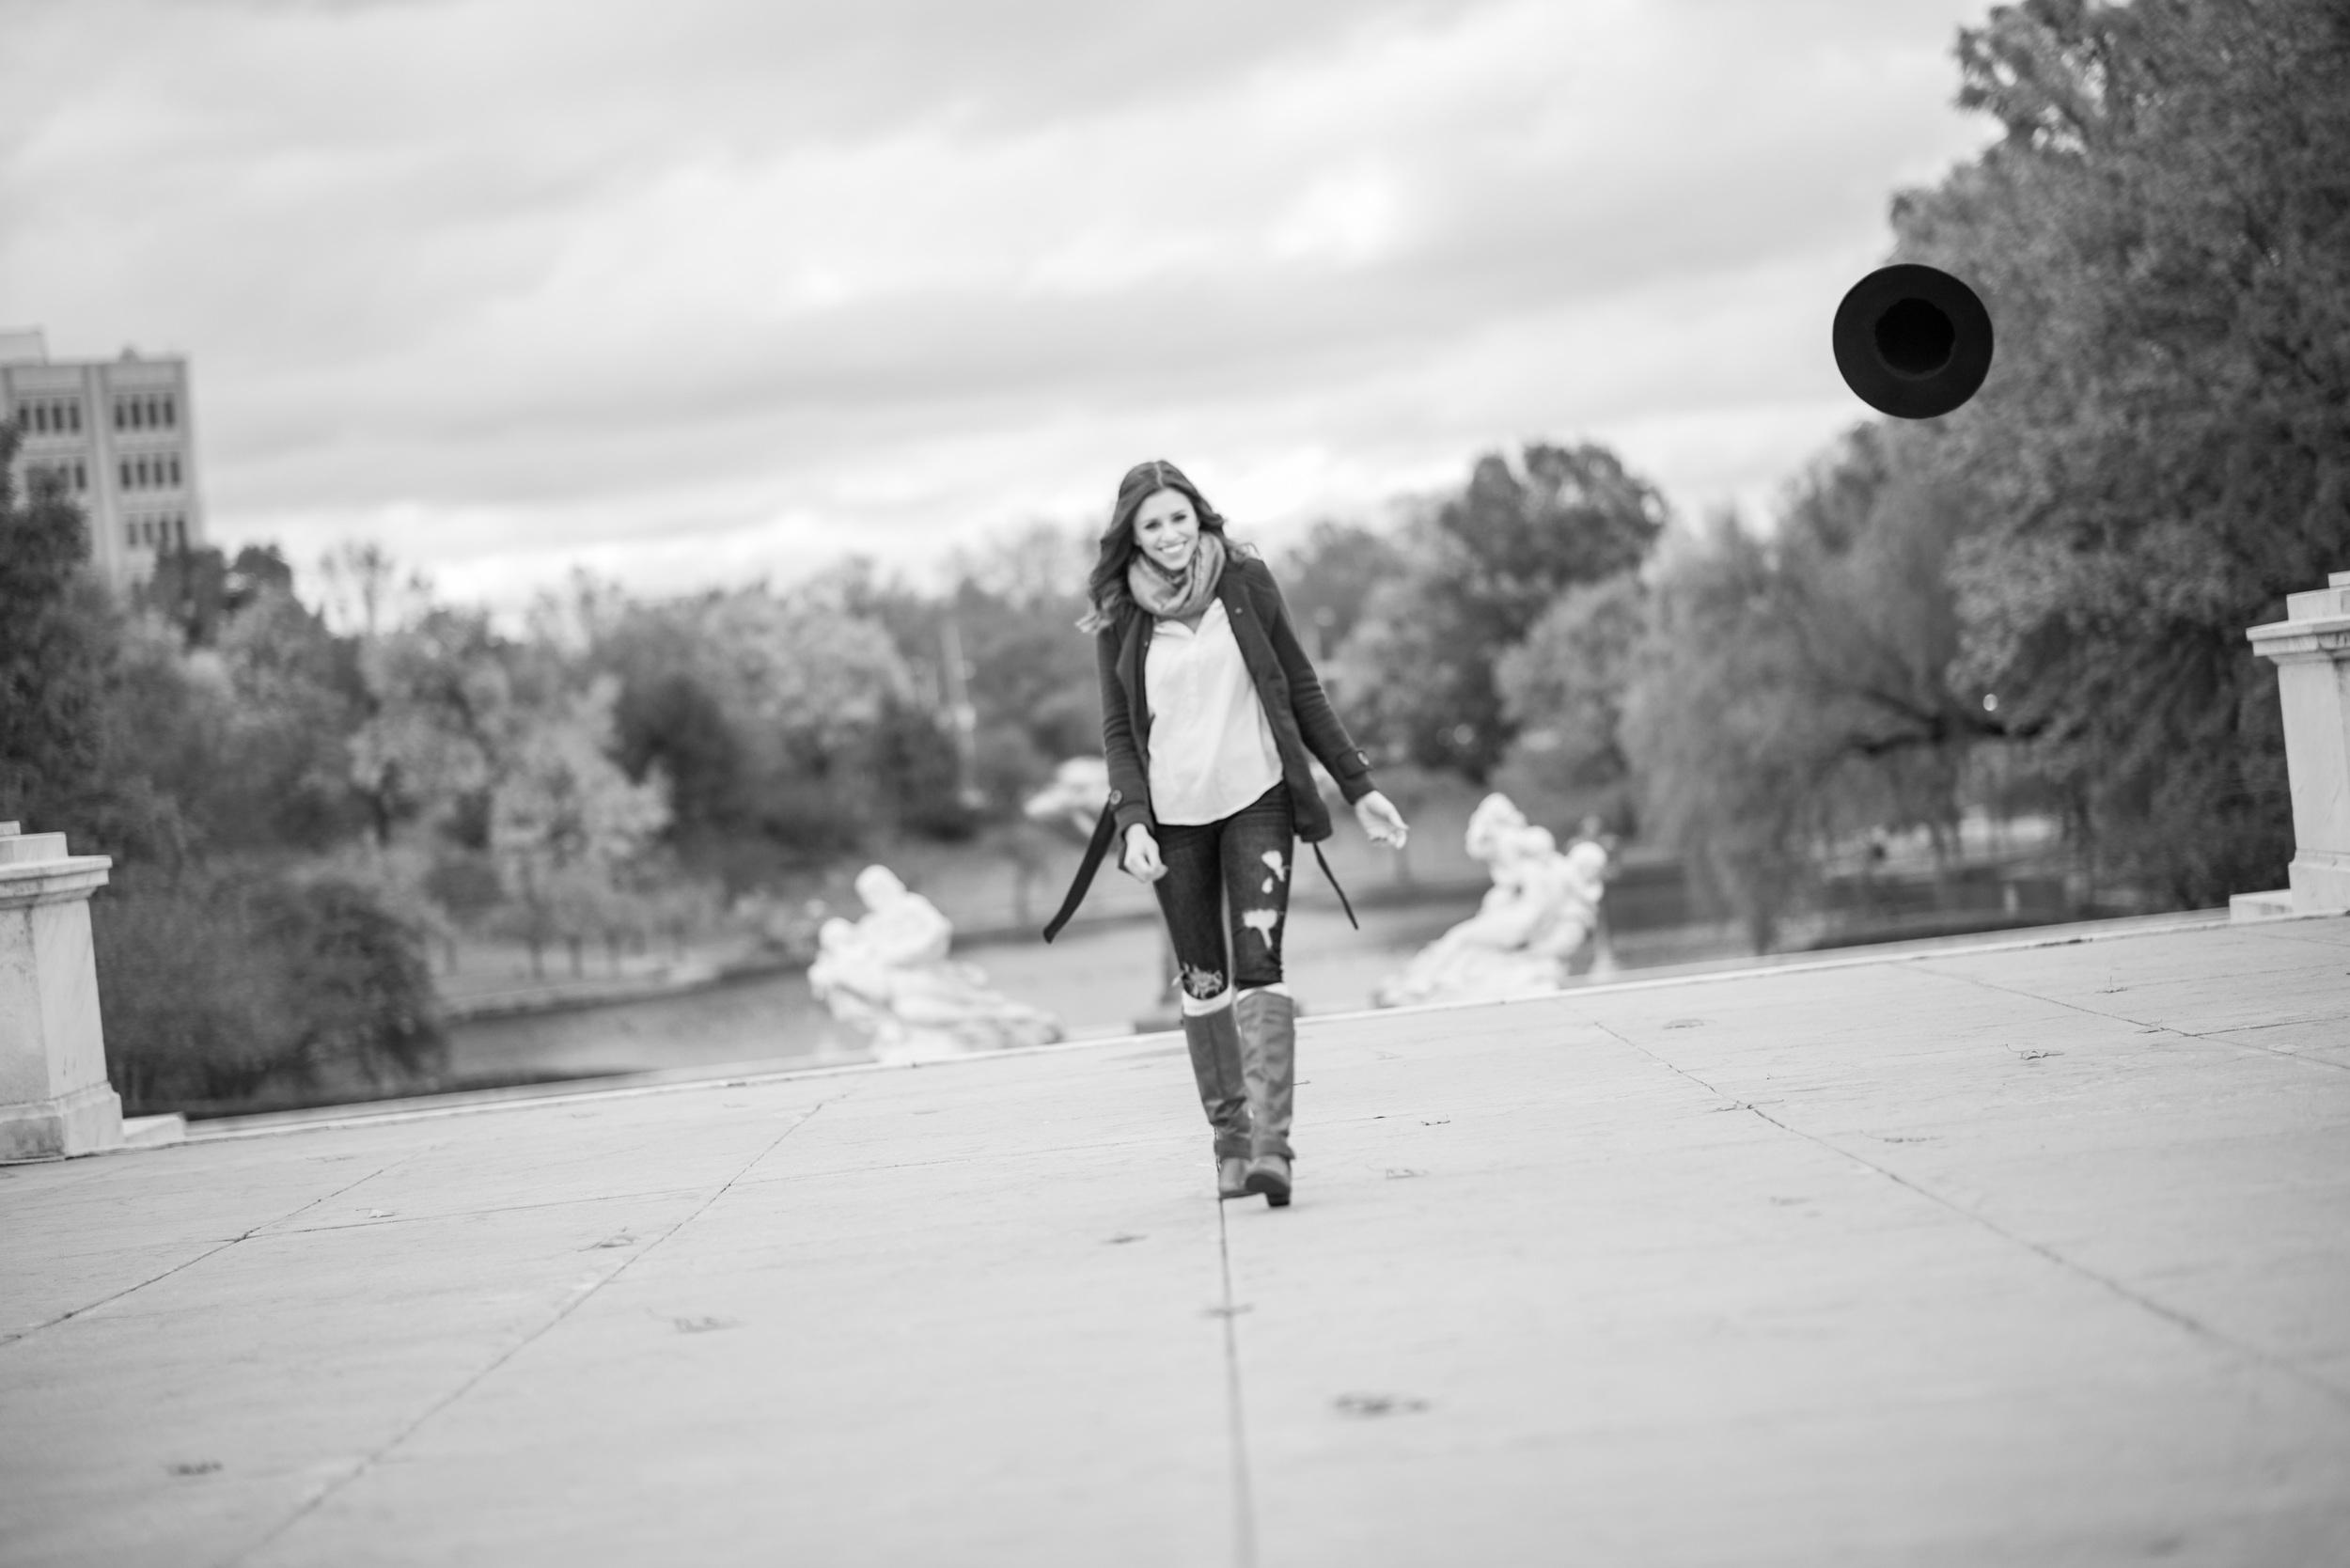 Matt_Swetel_Photography_Blog_Gracie_Kurtz007.jpg